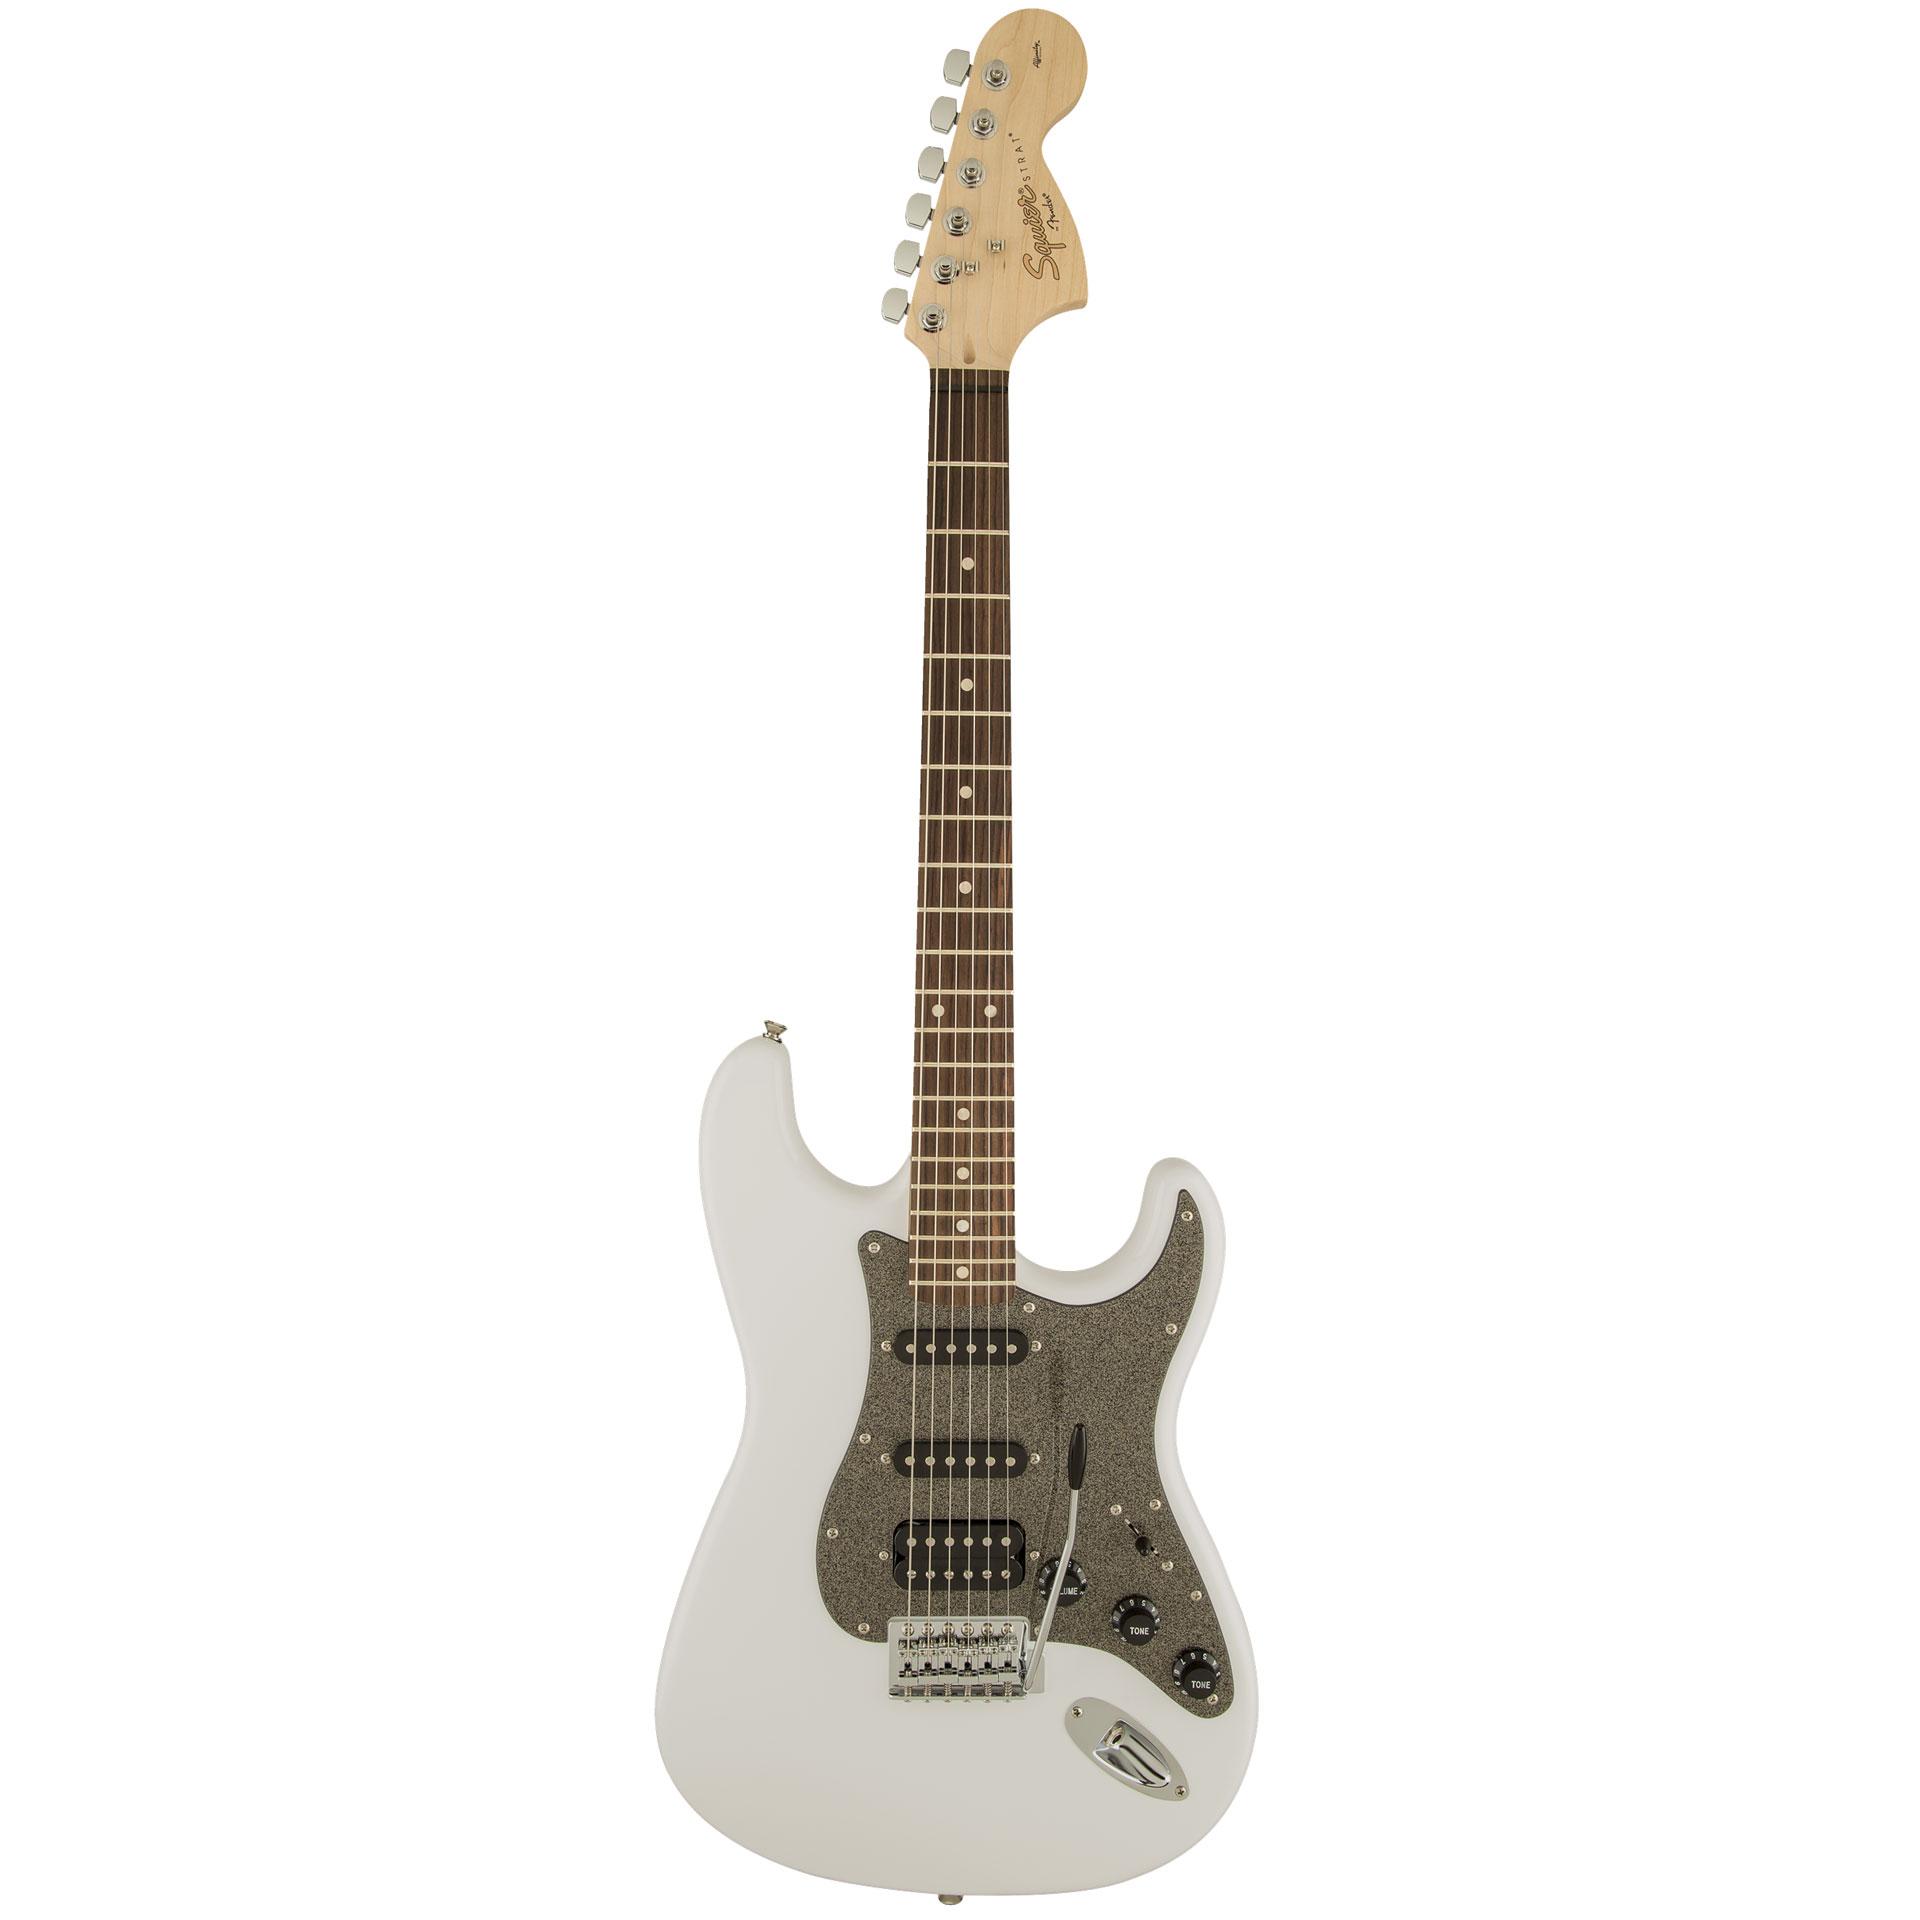 squier affinity strat hss rw owt electric guitar. Black Bedroom Furniture Sets. Home Design Ideas